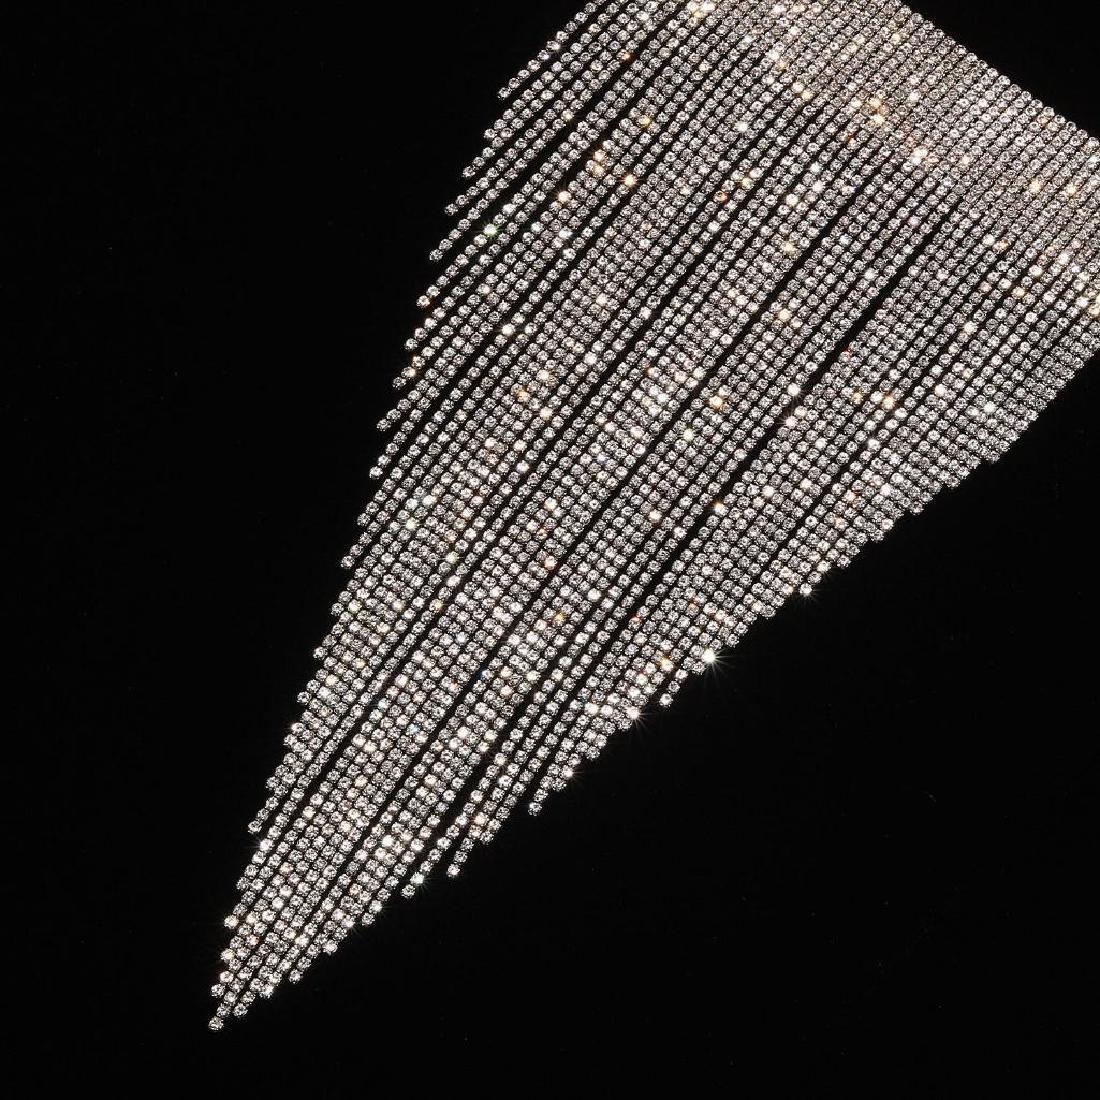 Holylove Charm Rhinestone Tassels Choker Collar Pendant - 3